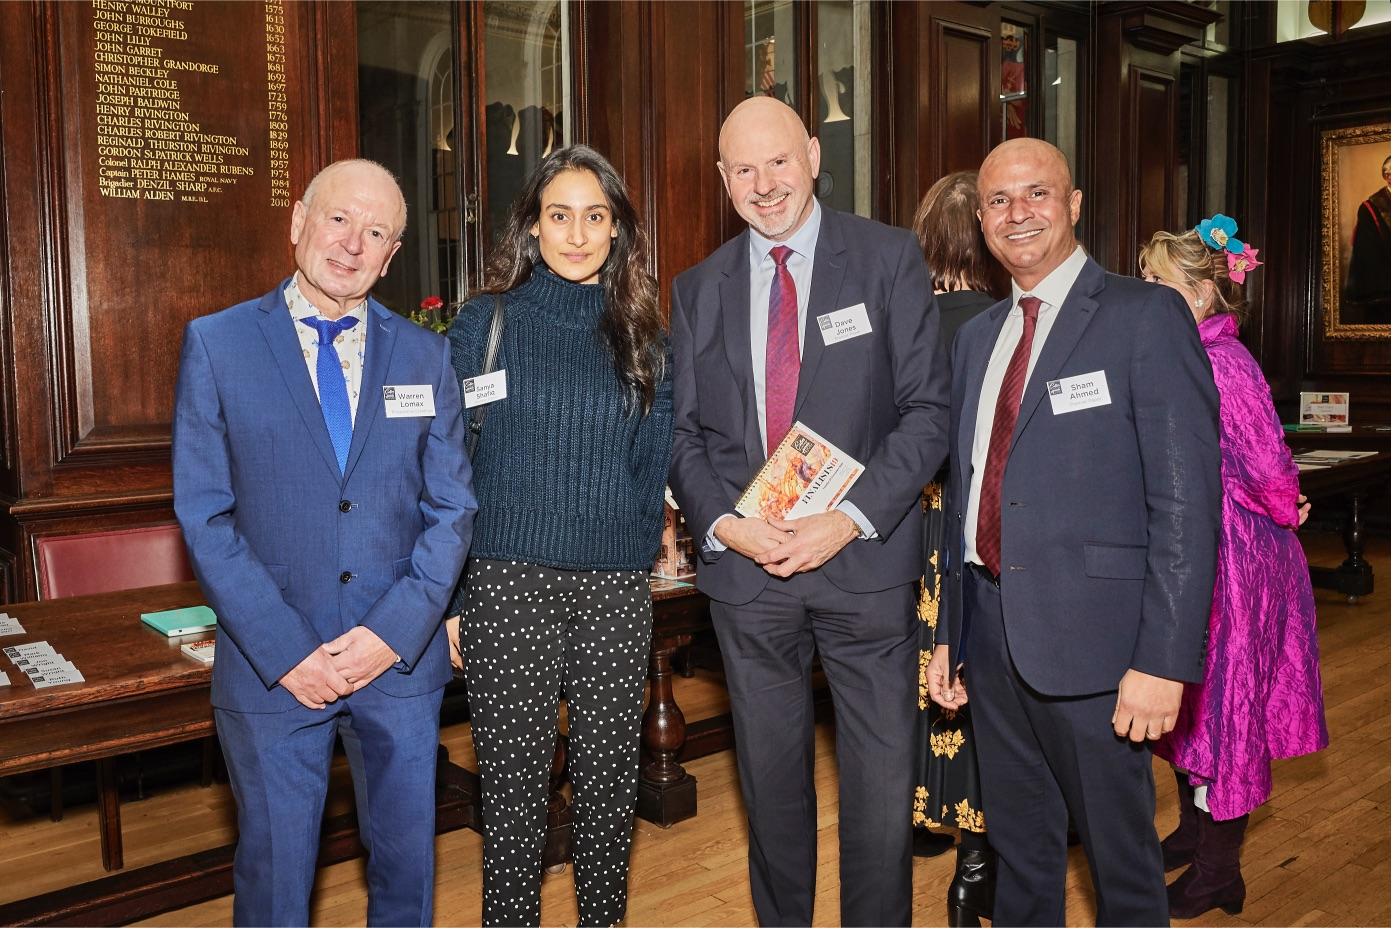 Above: (left-right) PG's Warren Lomax with Premier Paper's Sanya Shafiq, Dave Jones and Sham Ahmed.